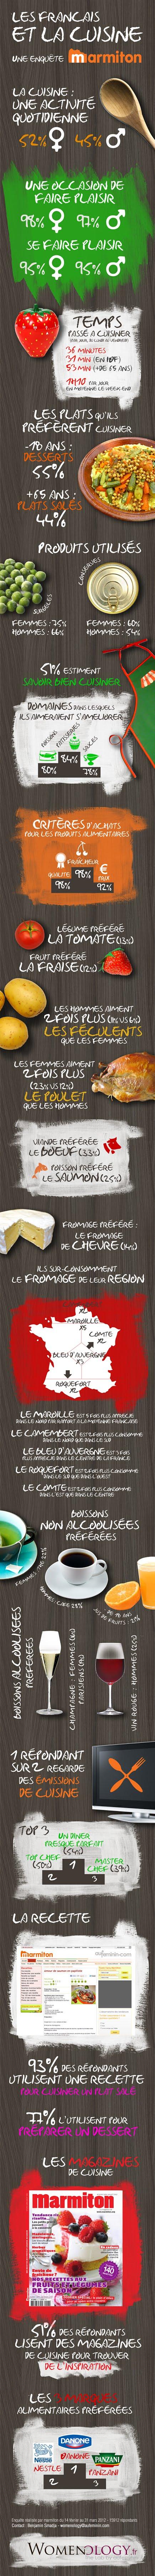 http://www.womenology.fr/secteurs/infographie-francais-cuisine/